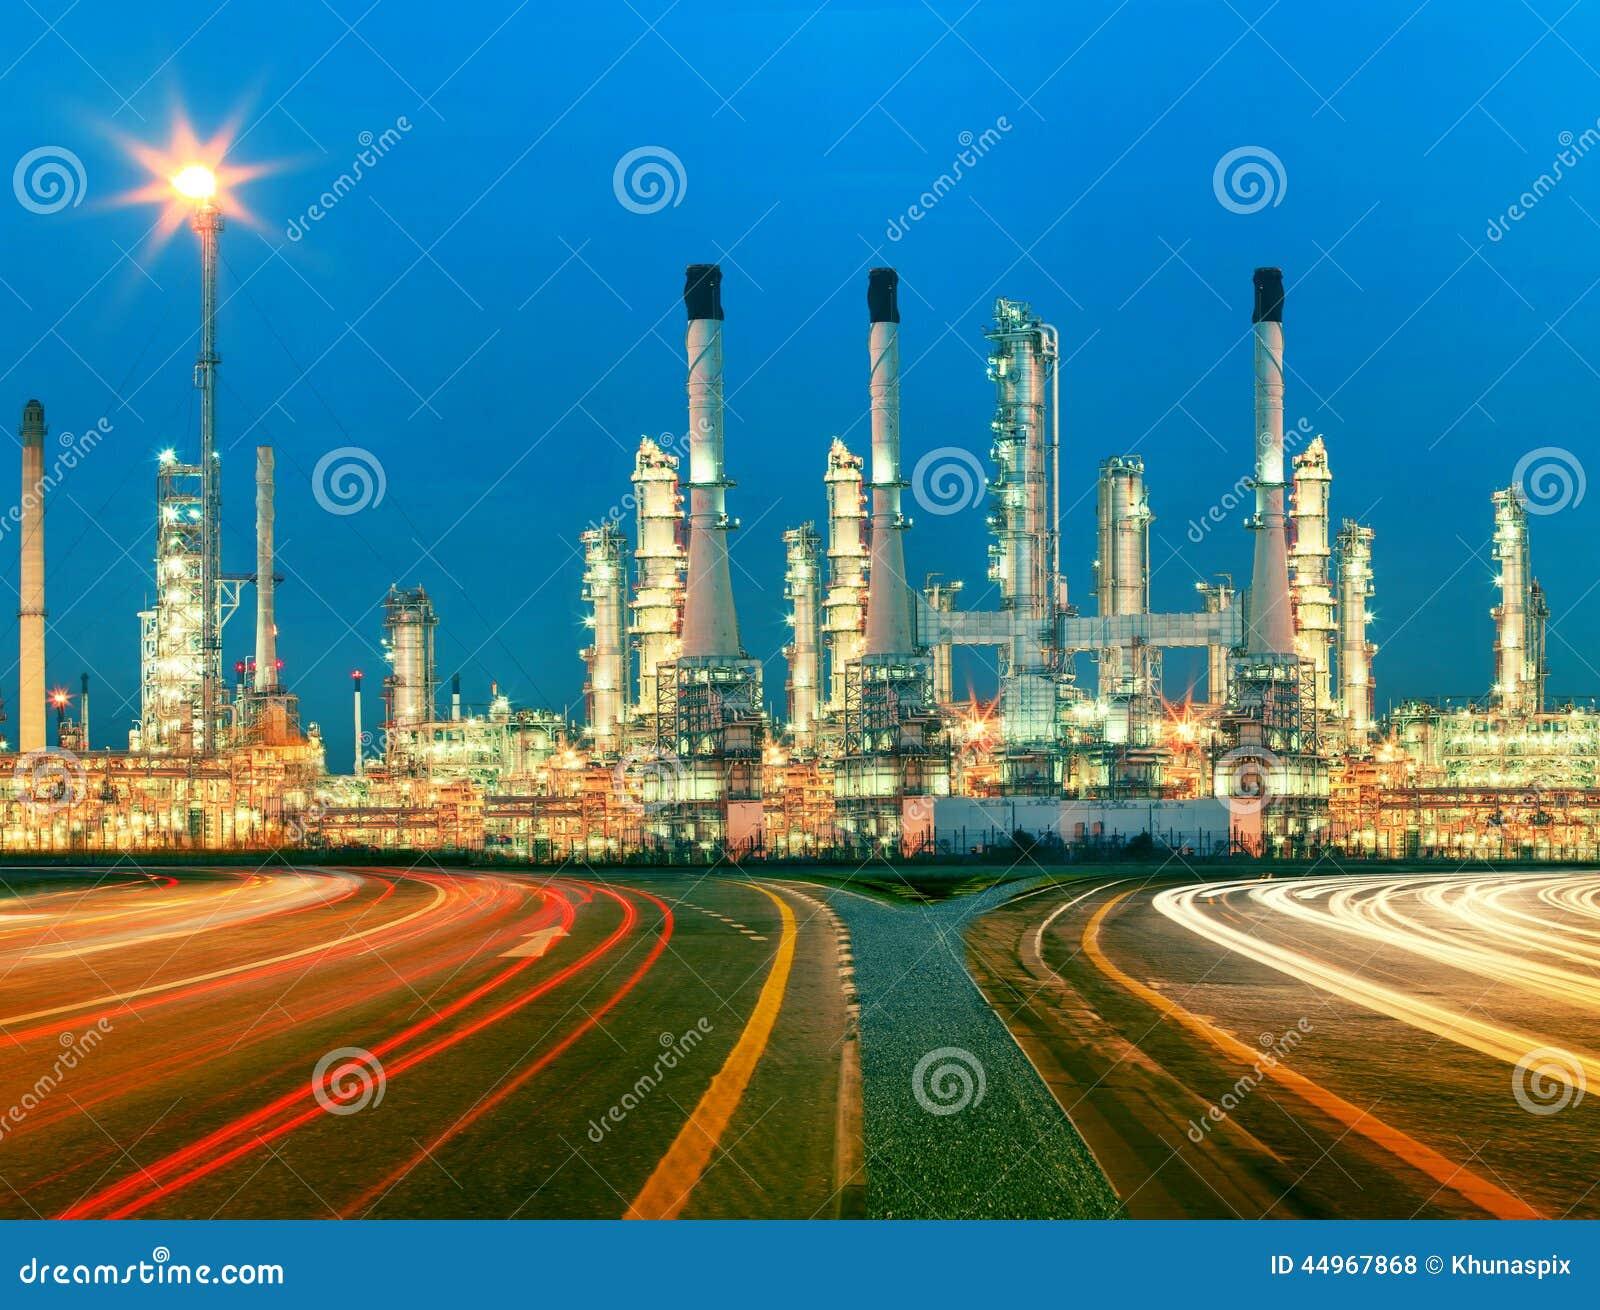 Beautiful Lighting Of Oil Refinery Plant In Heav